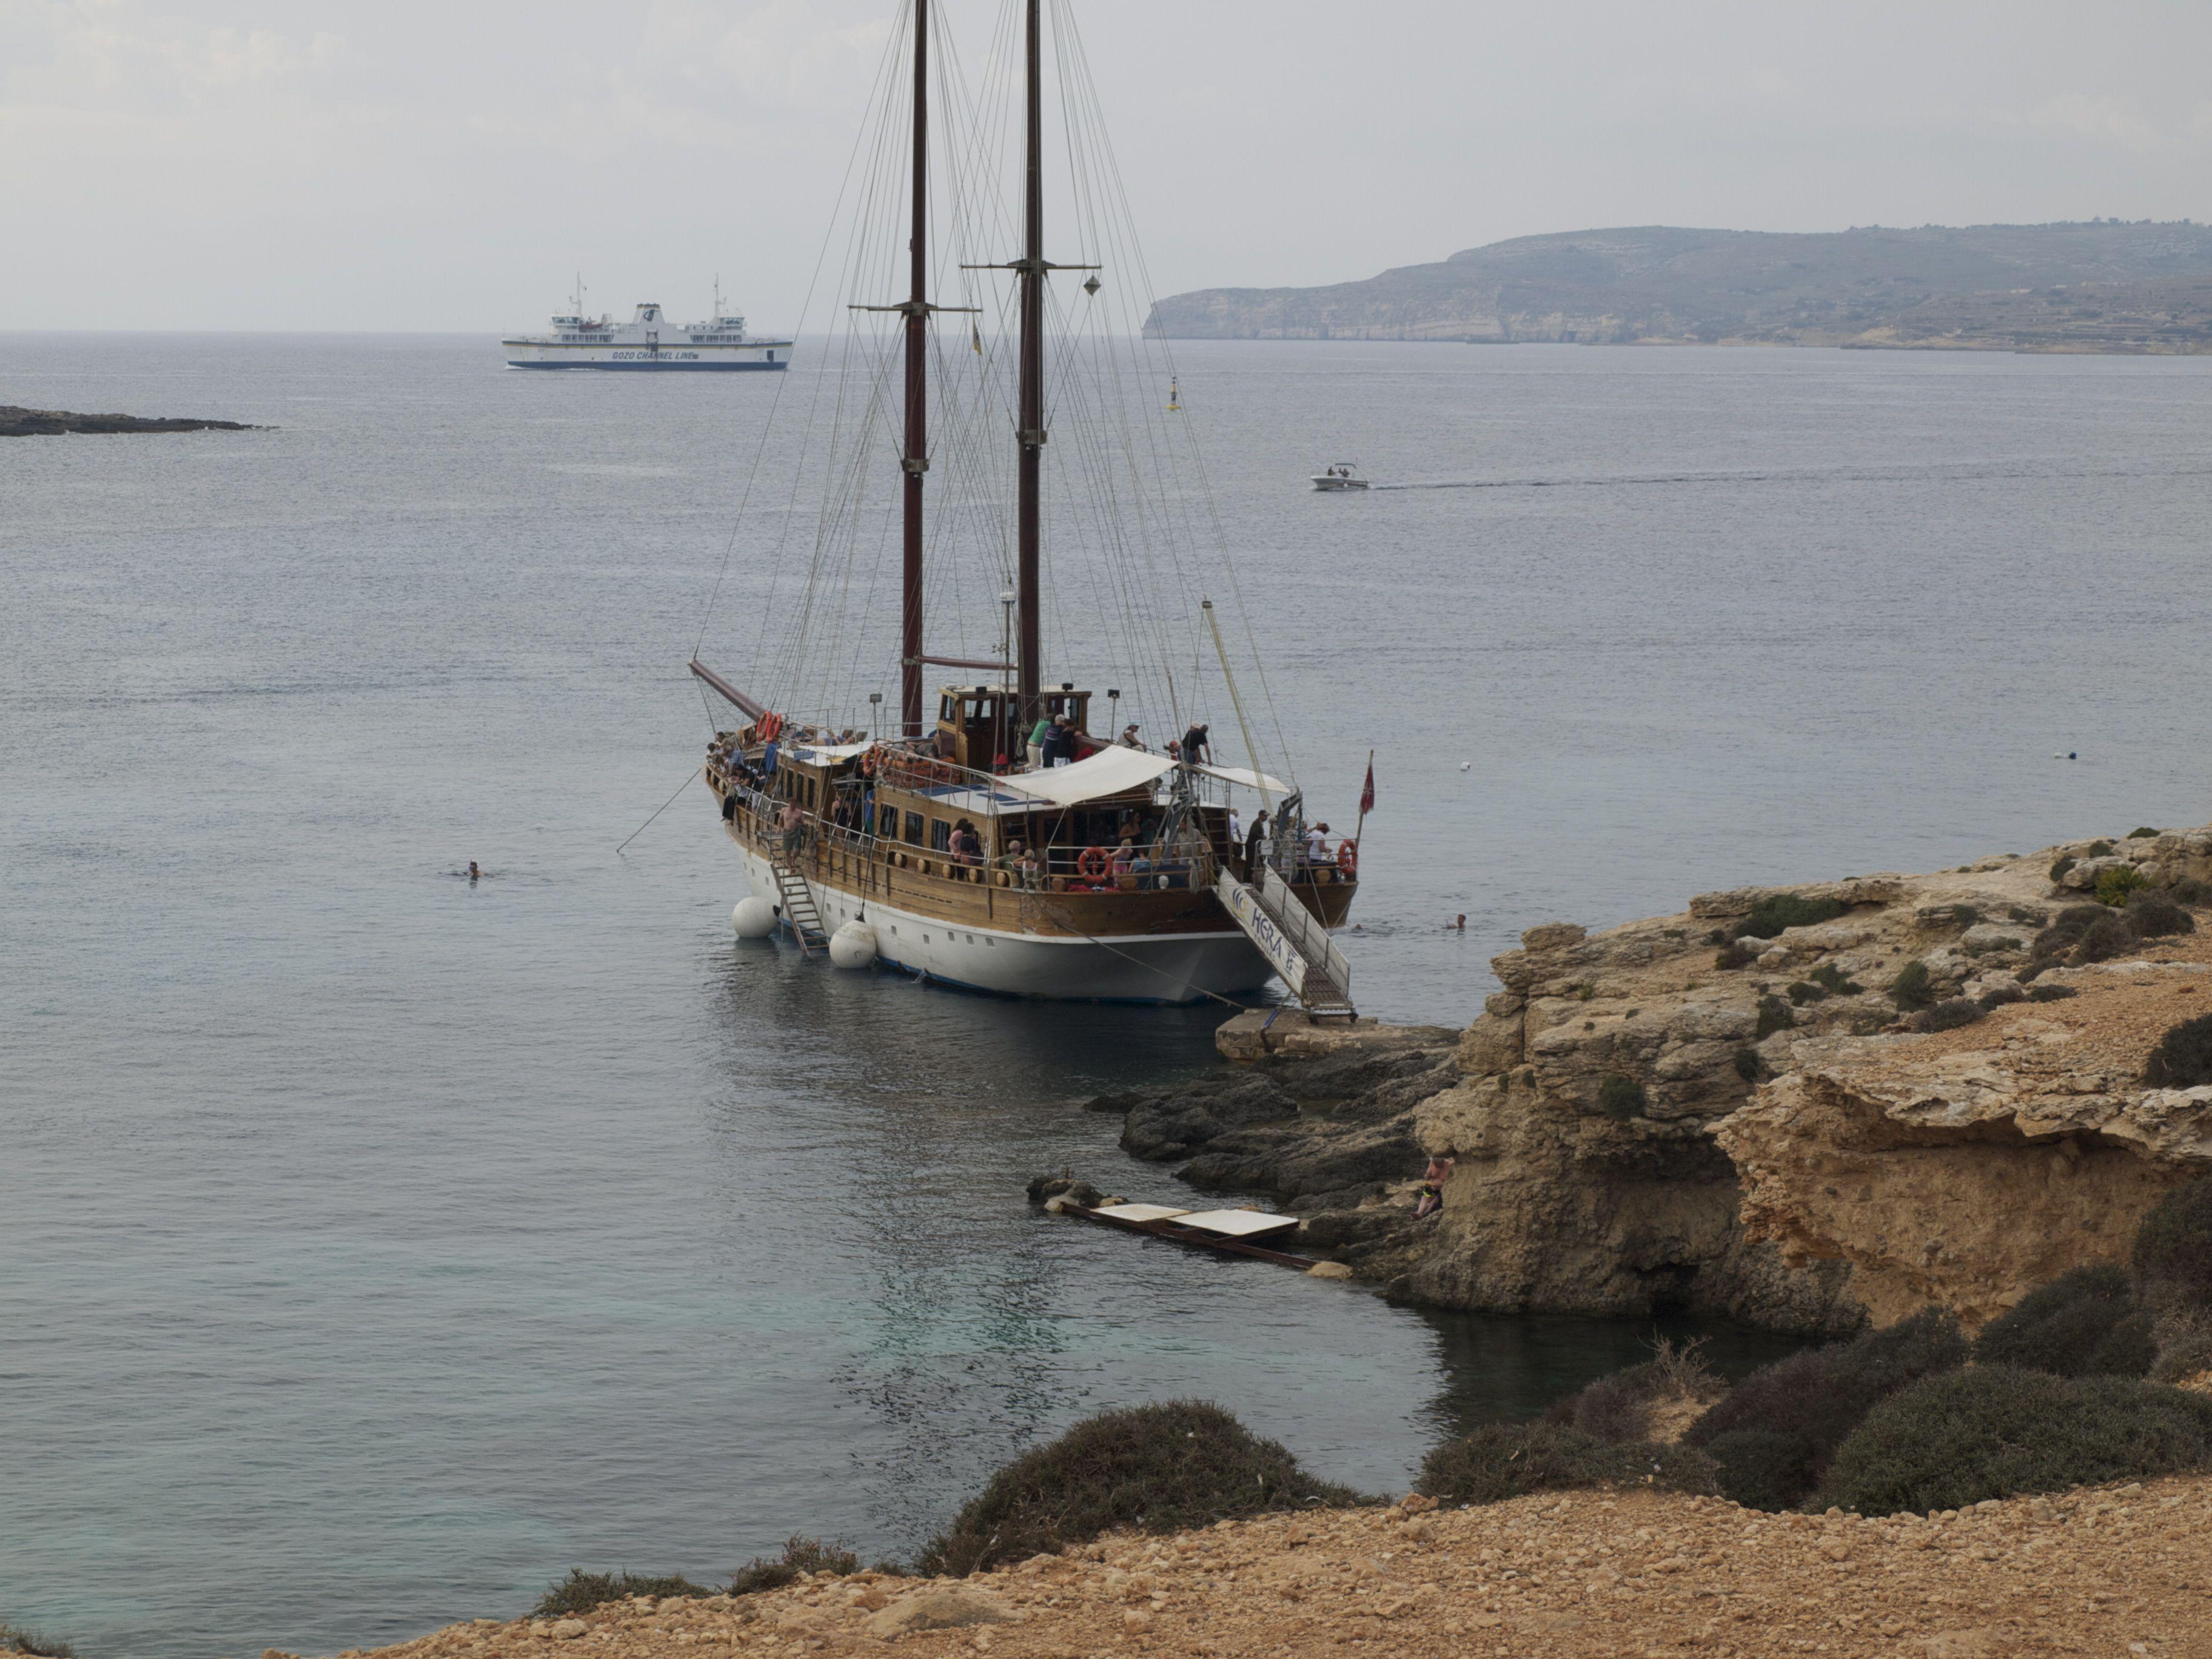 Sailing around Malta   Photo by Jessica Lipowski